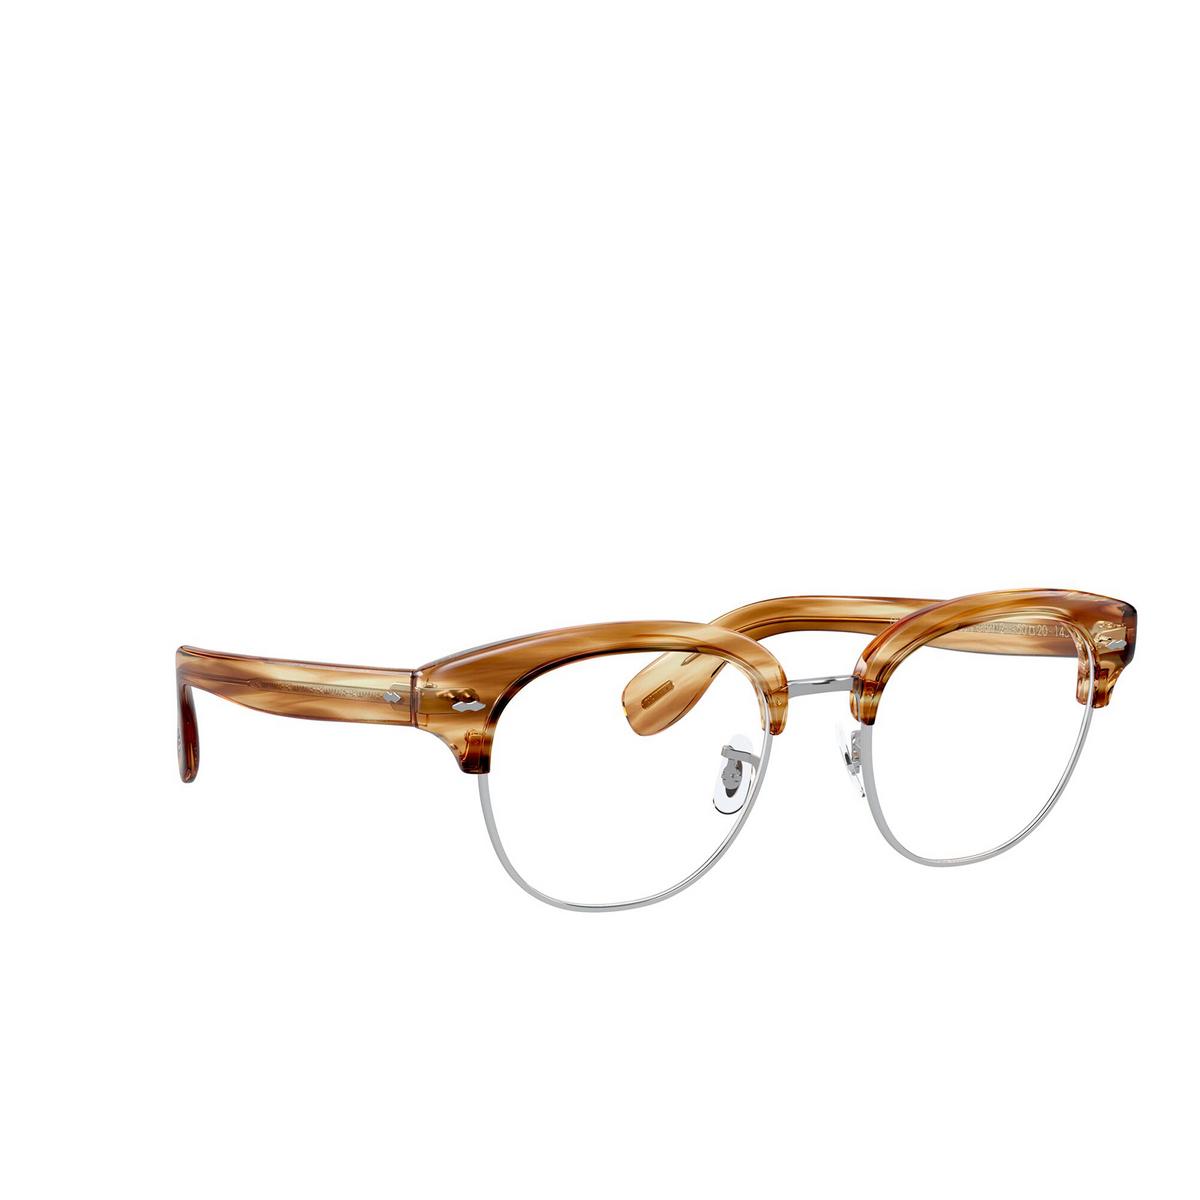 Oliver Peoples® Square Eyeglasses: Cary Grant 2 OV5436 color Honey Vsb 1674 - three-quarters view.